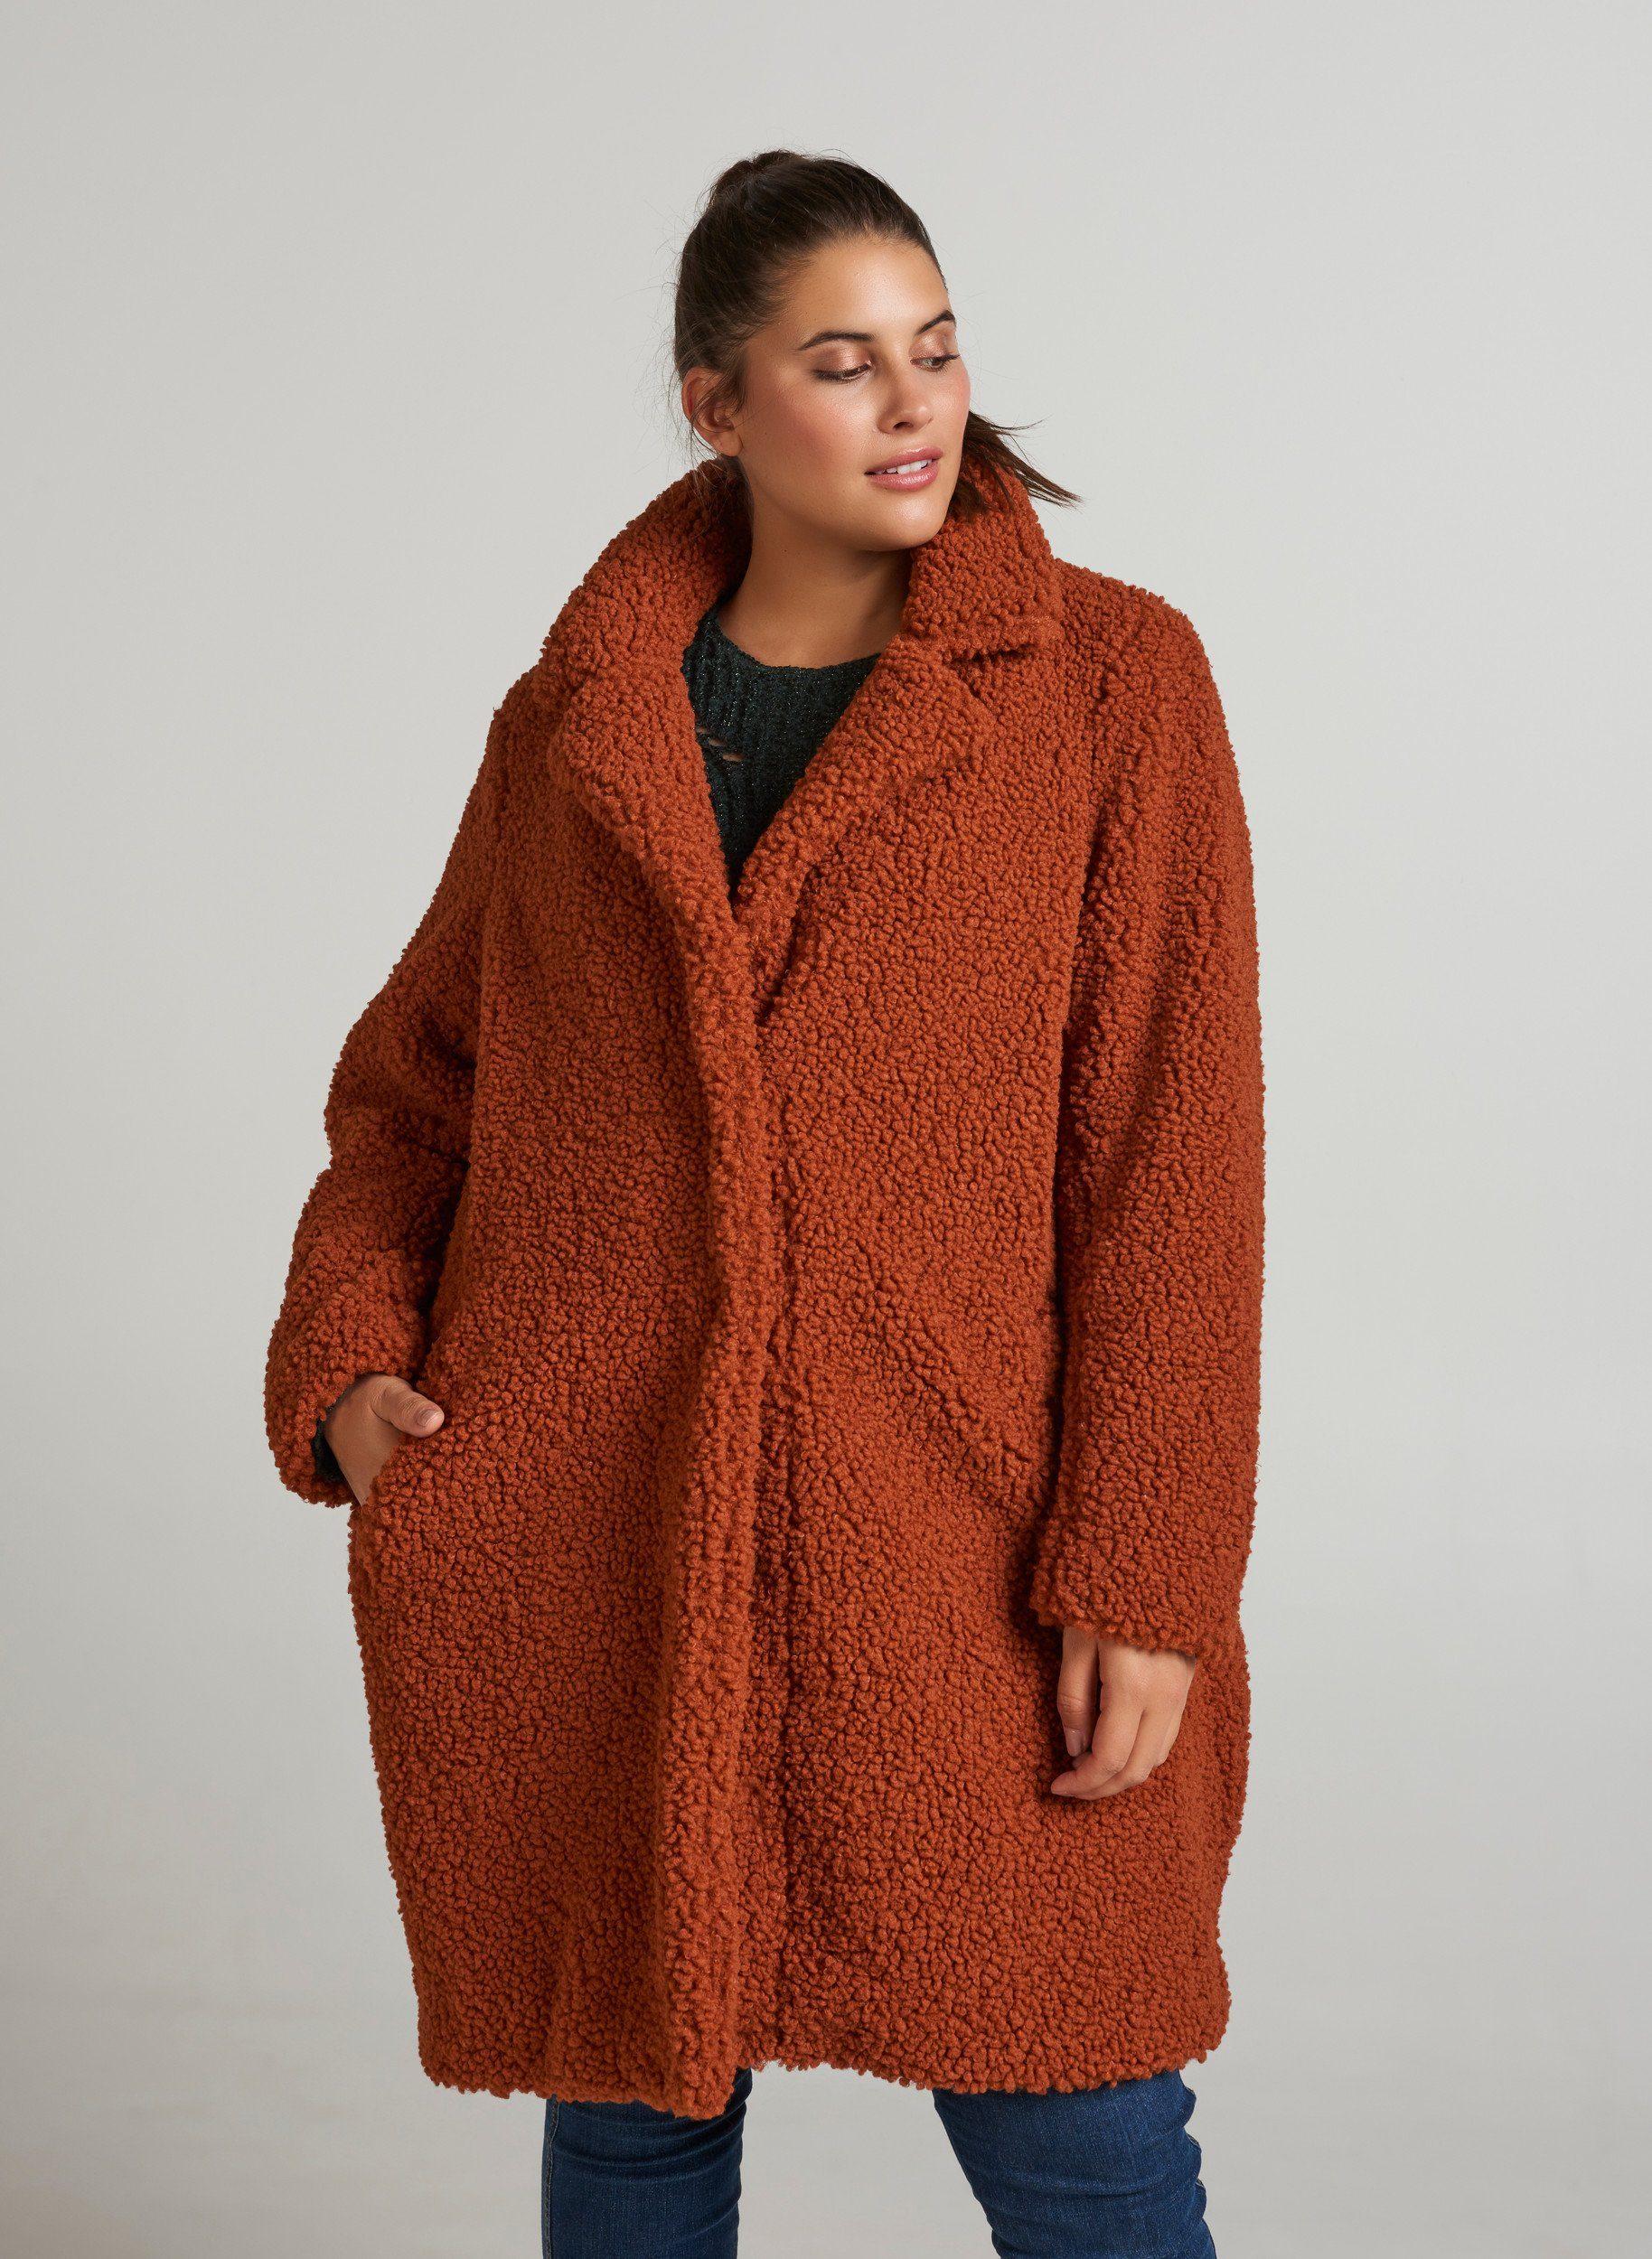 Kragen Kariert kaufenOTTO Damen WintermantelKaromuster Zizzi Outdoorjacke Warm Große Größen online Mantel f6yYb7g